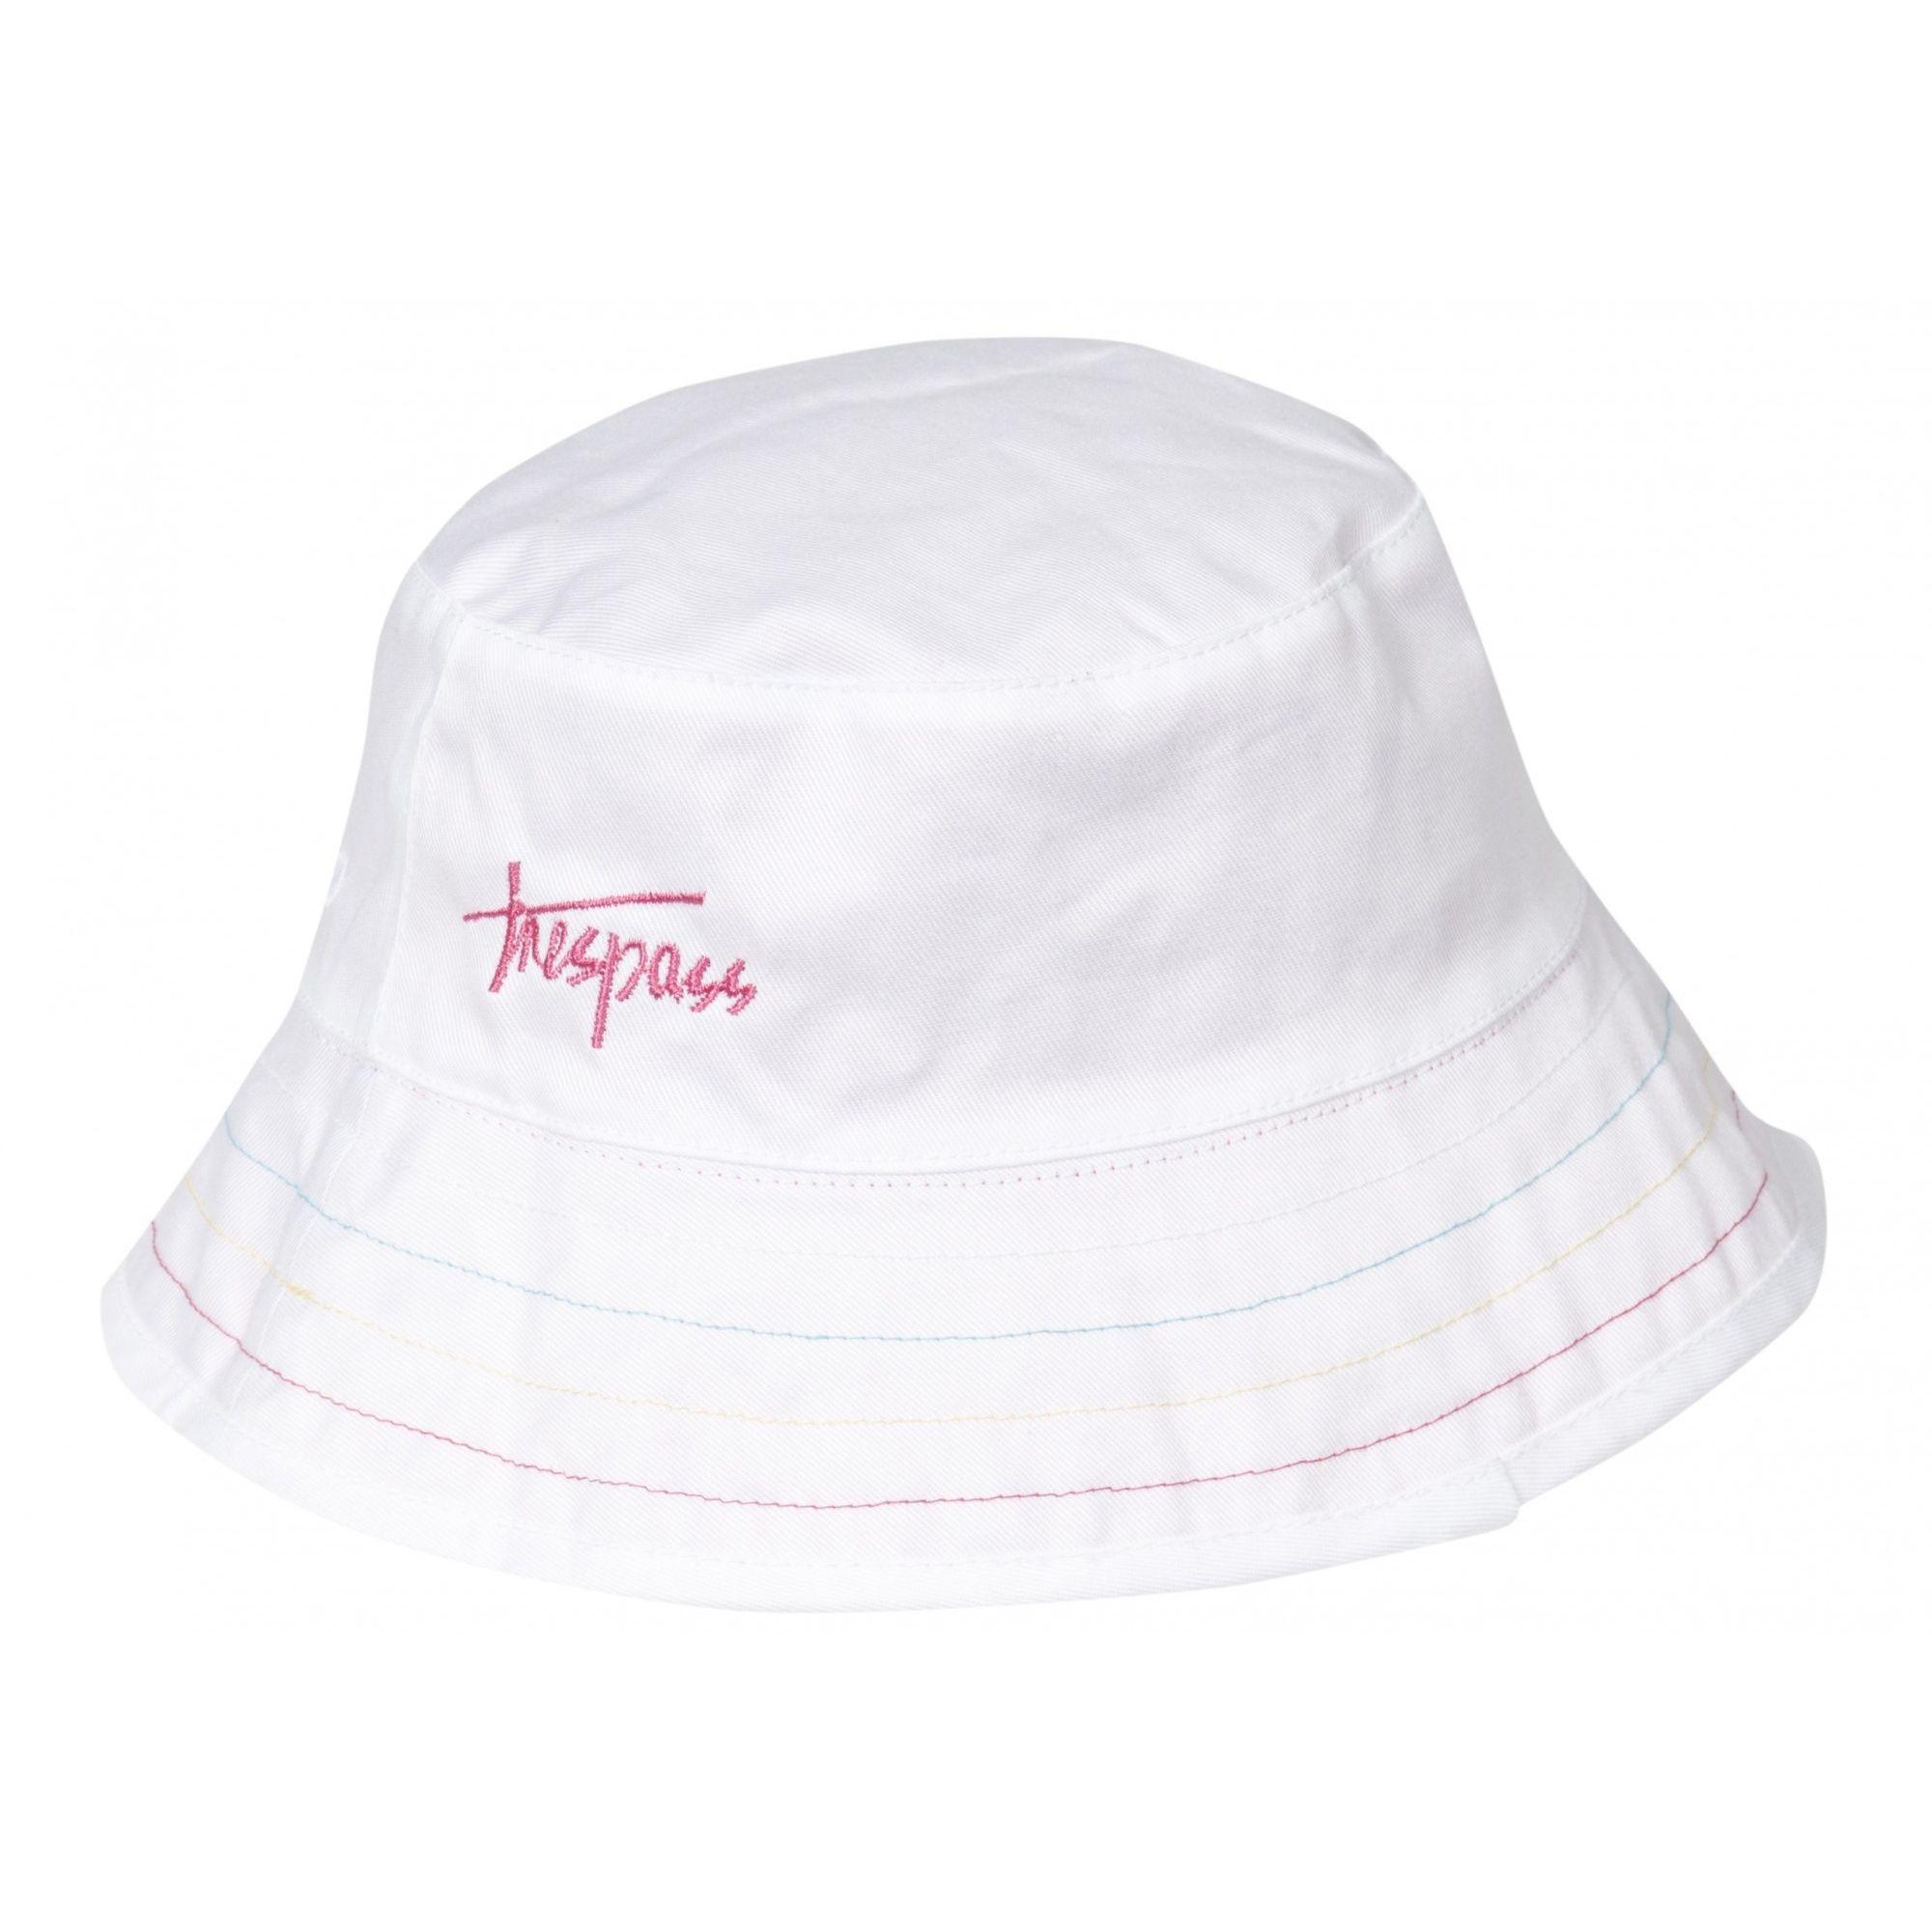 Trespass Seashore Reversible Summer Hat